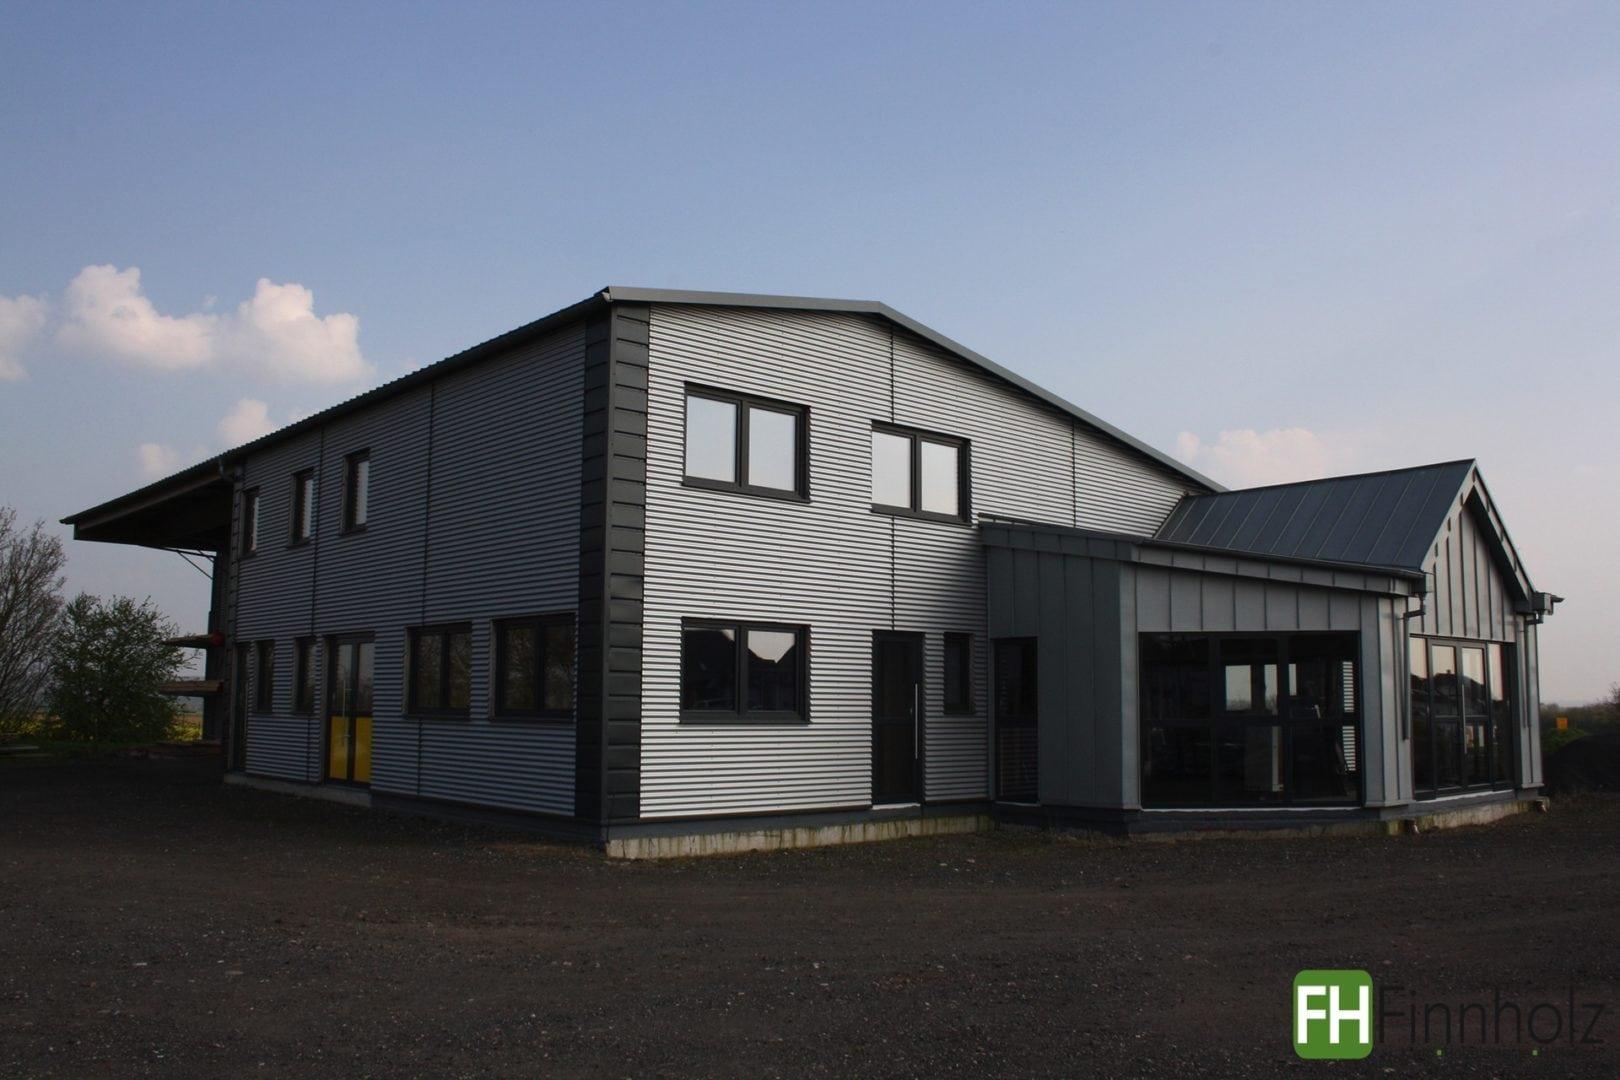 lagerhalle mit b ro in w lfersheim fh finnholz. Black Bedroom Furniture Sets. Home Design Ideas